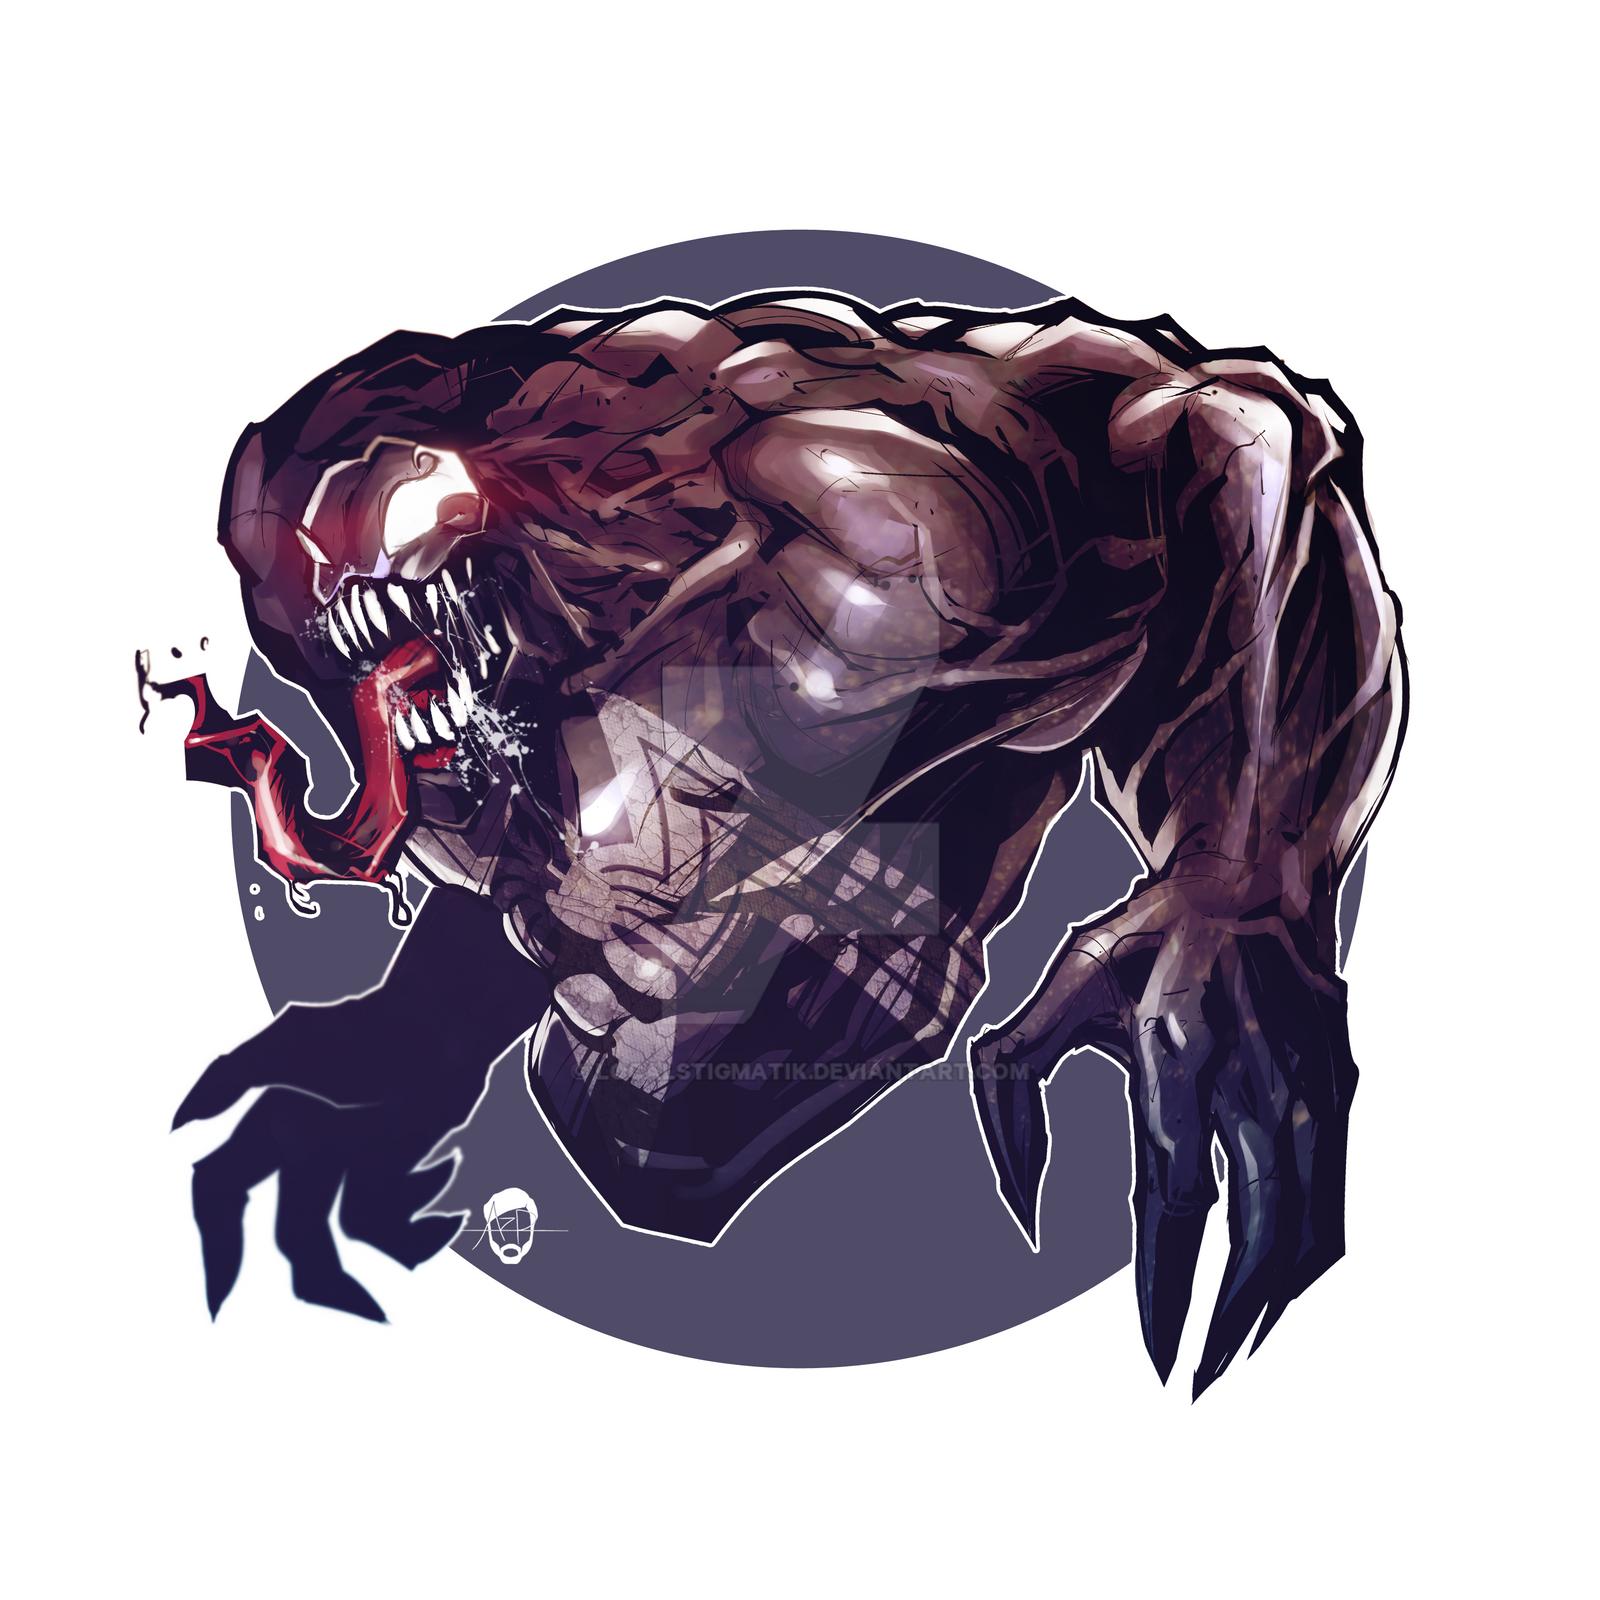 Venom by LocalStigmatik